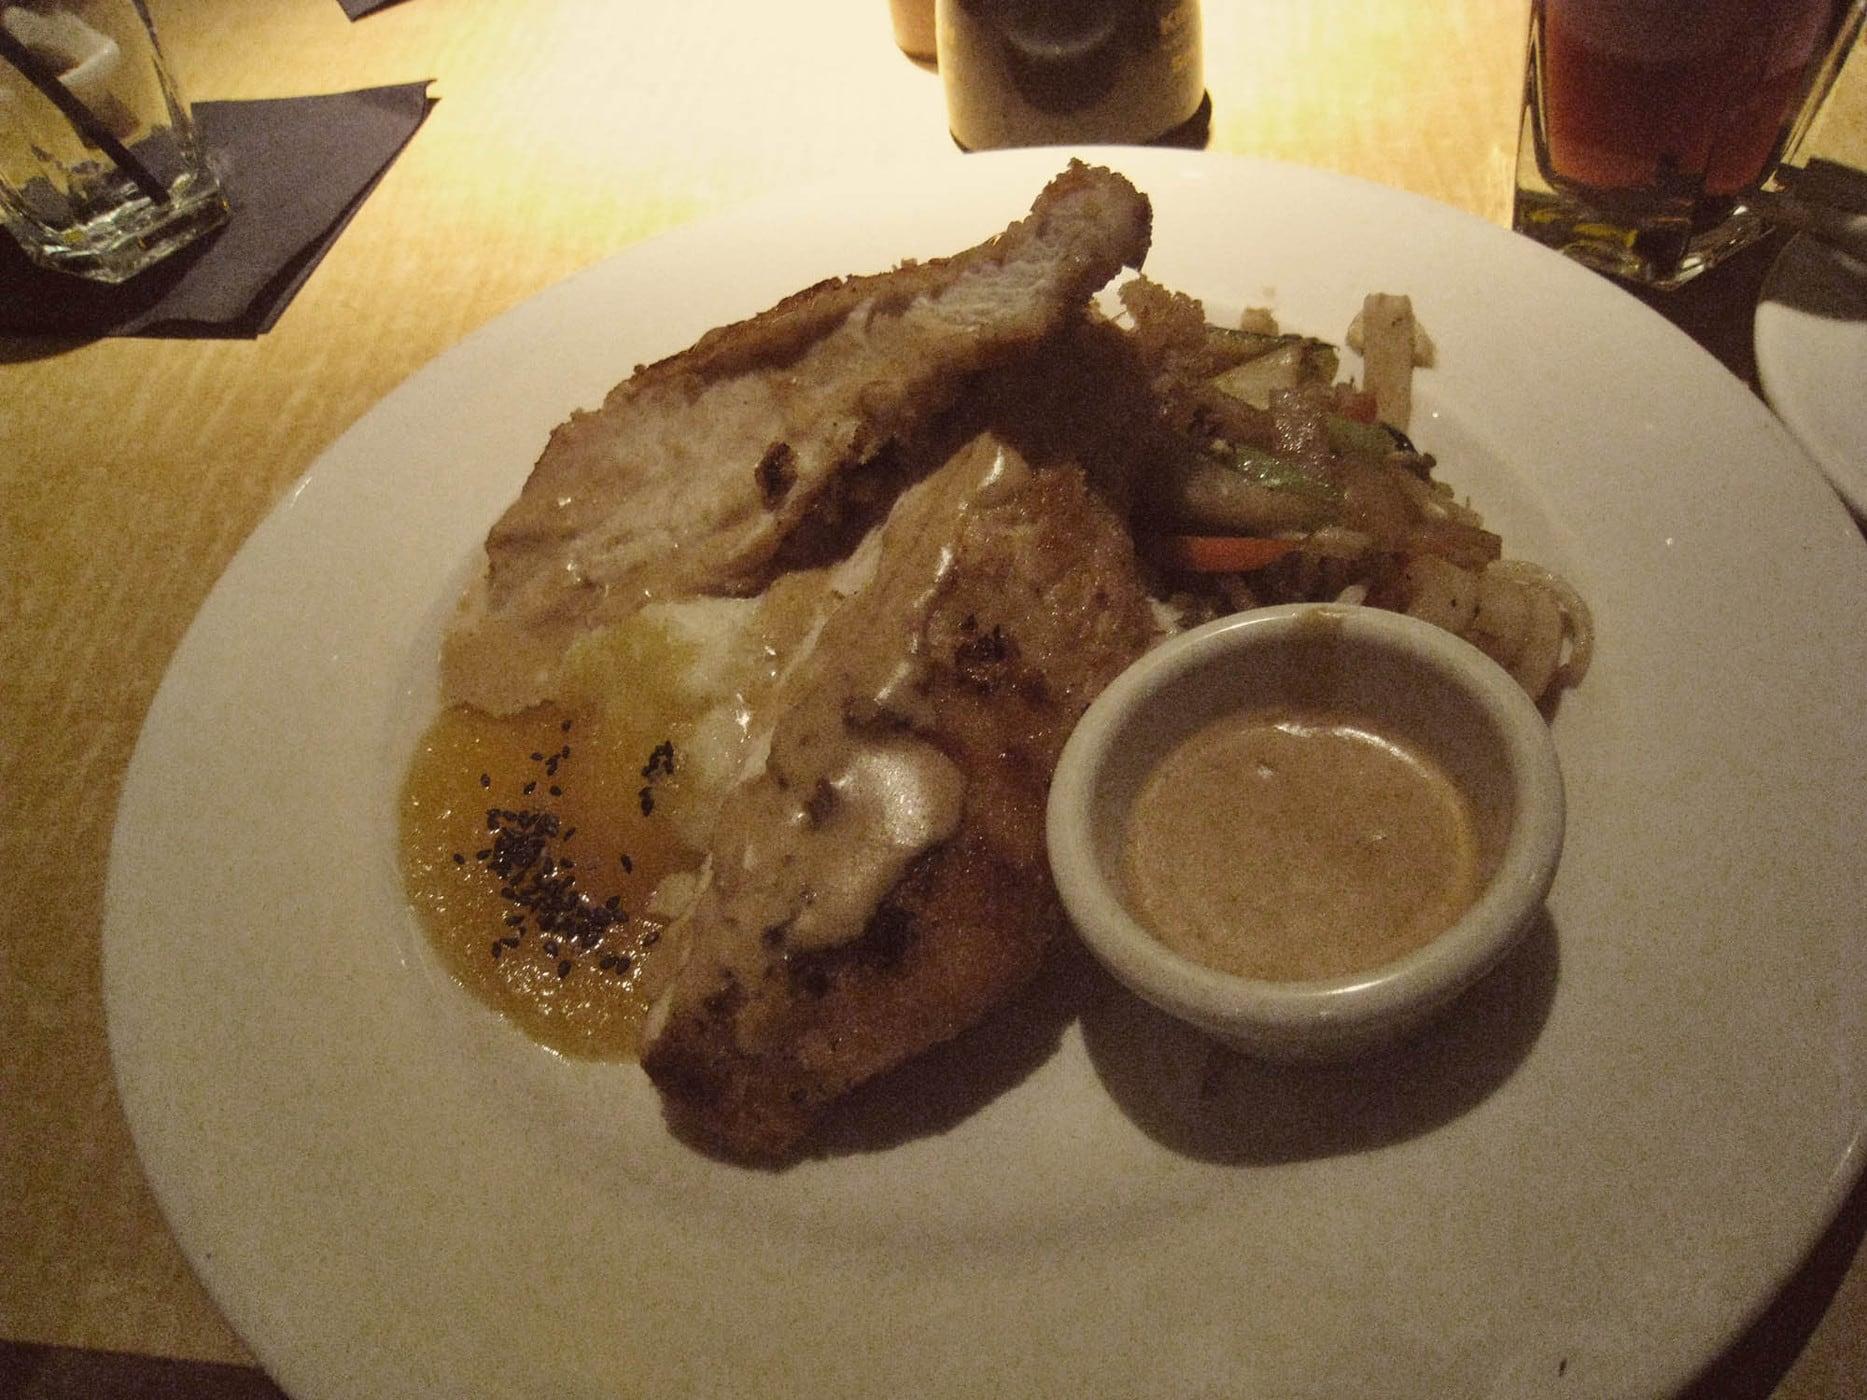 Macadamia nut chicken at Kona Grill